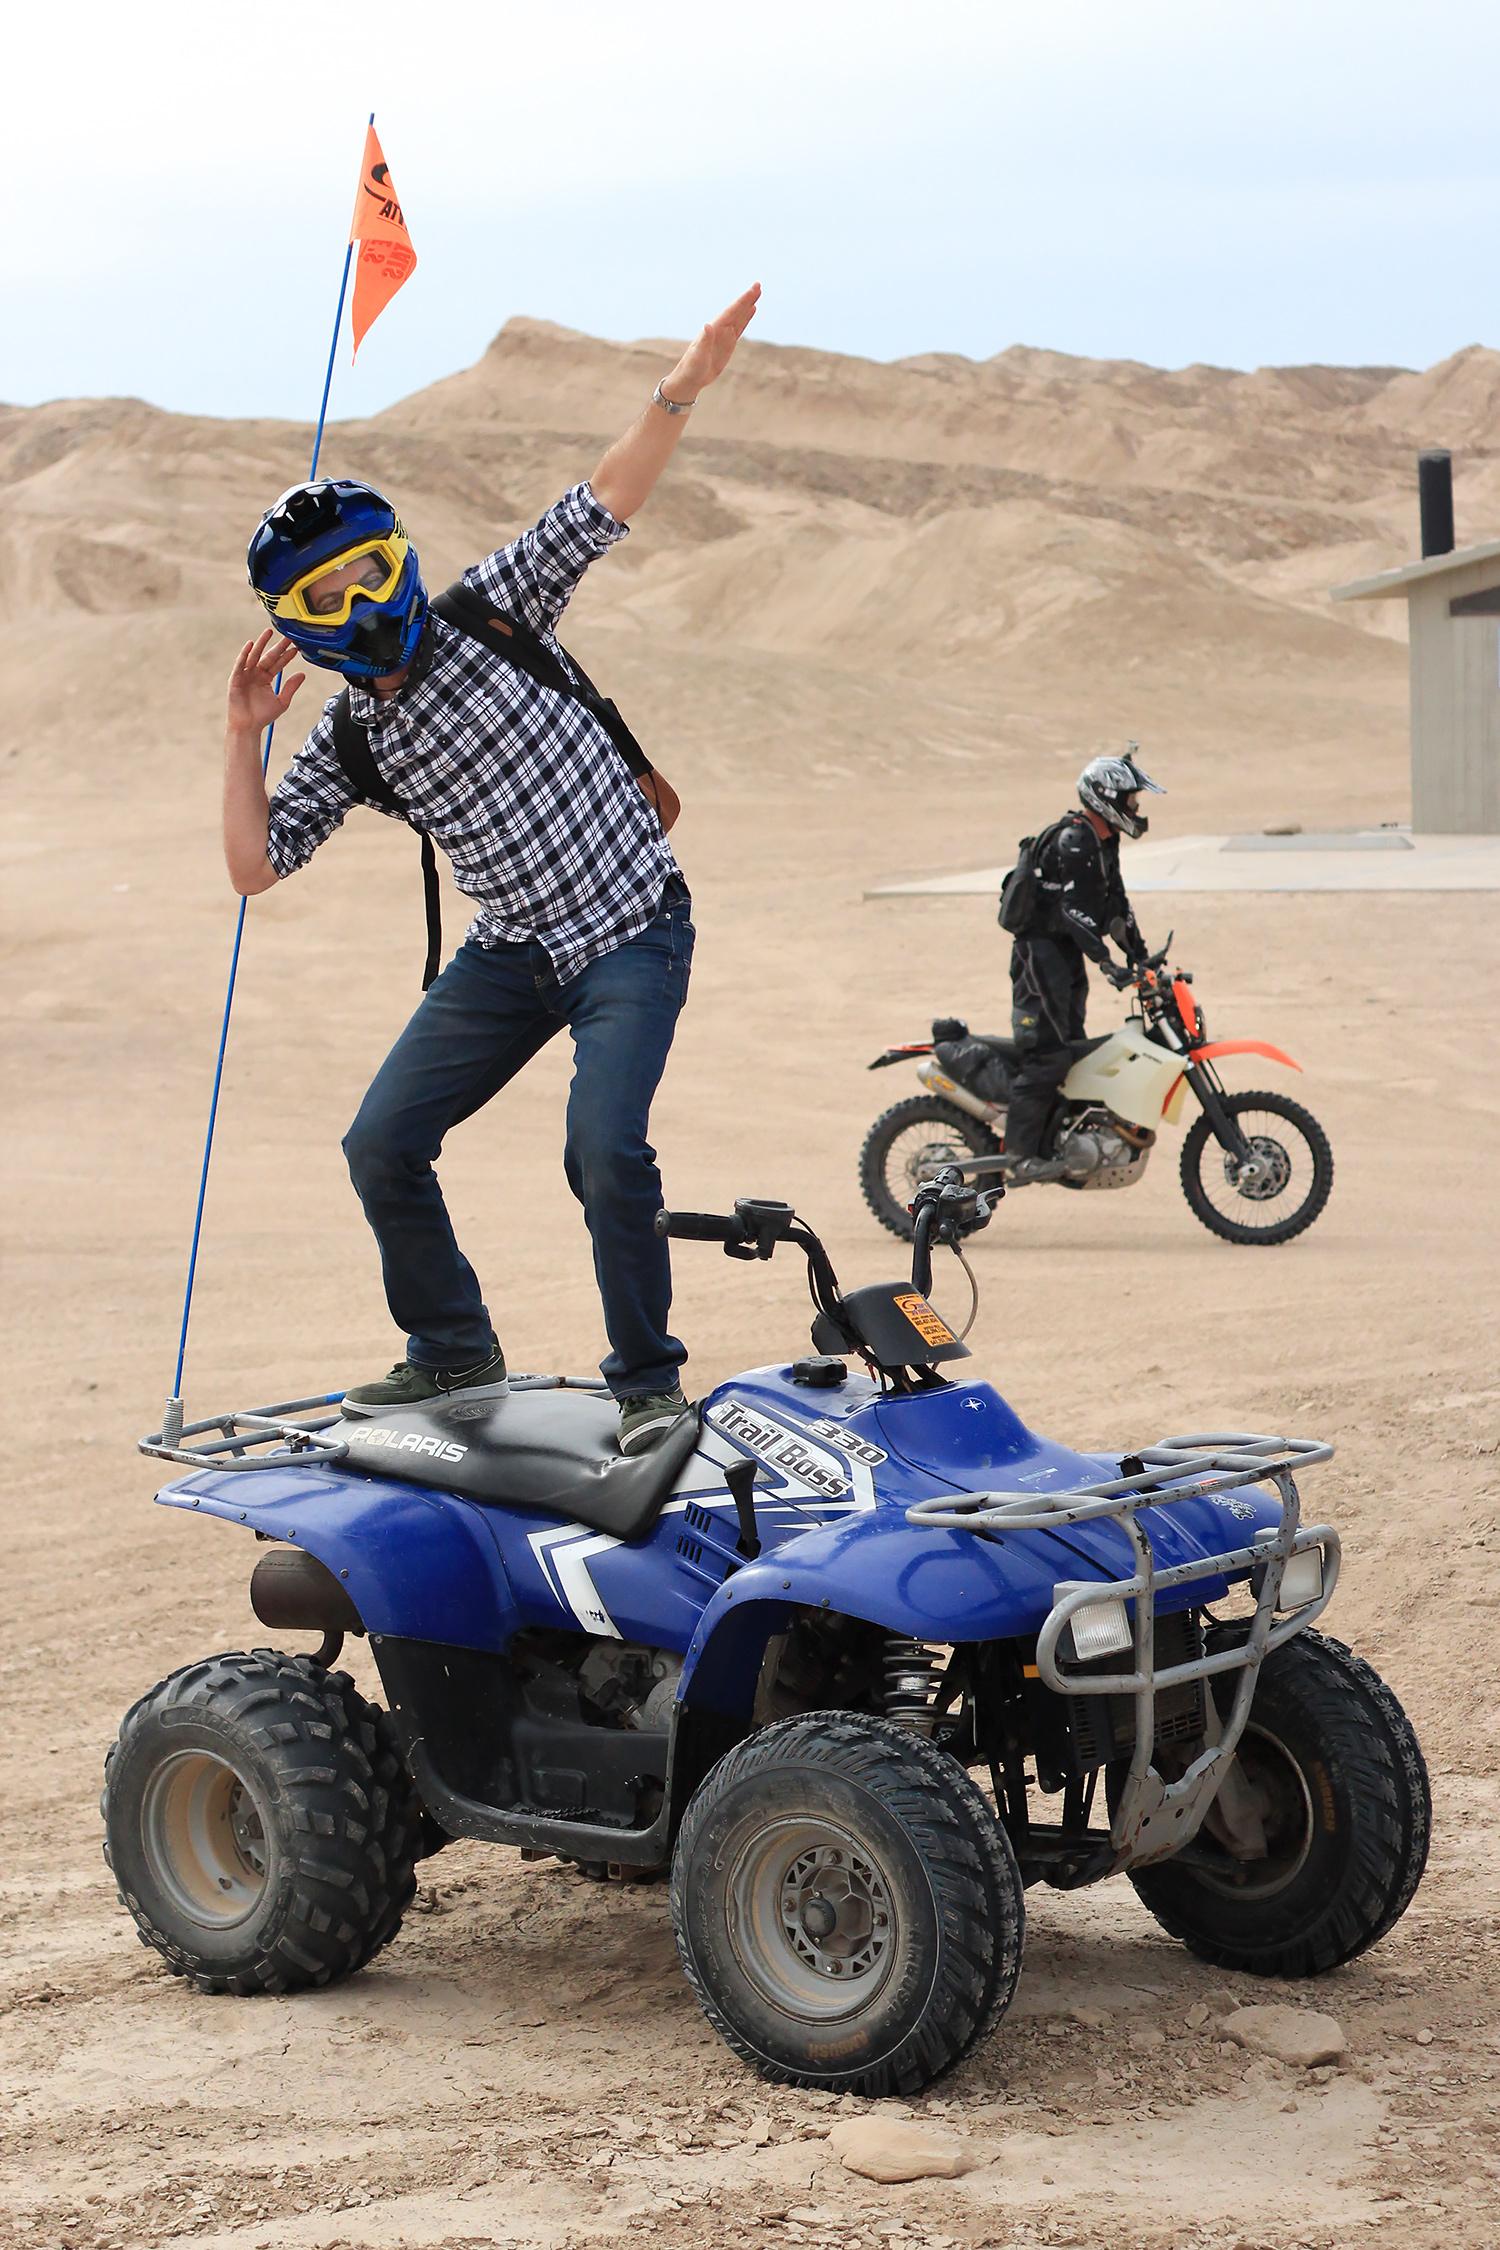 John striking a pose on the ATV